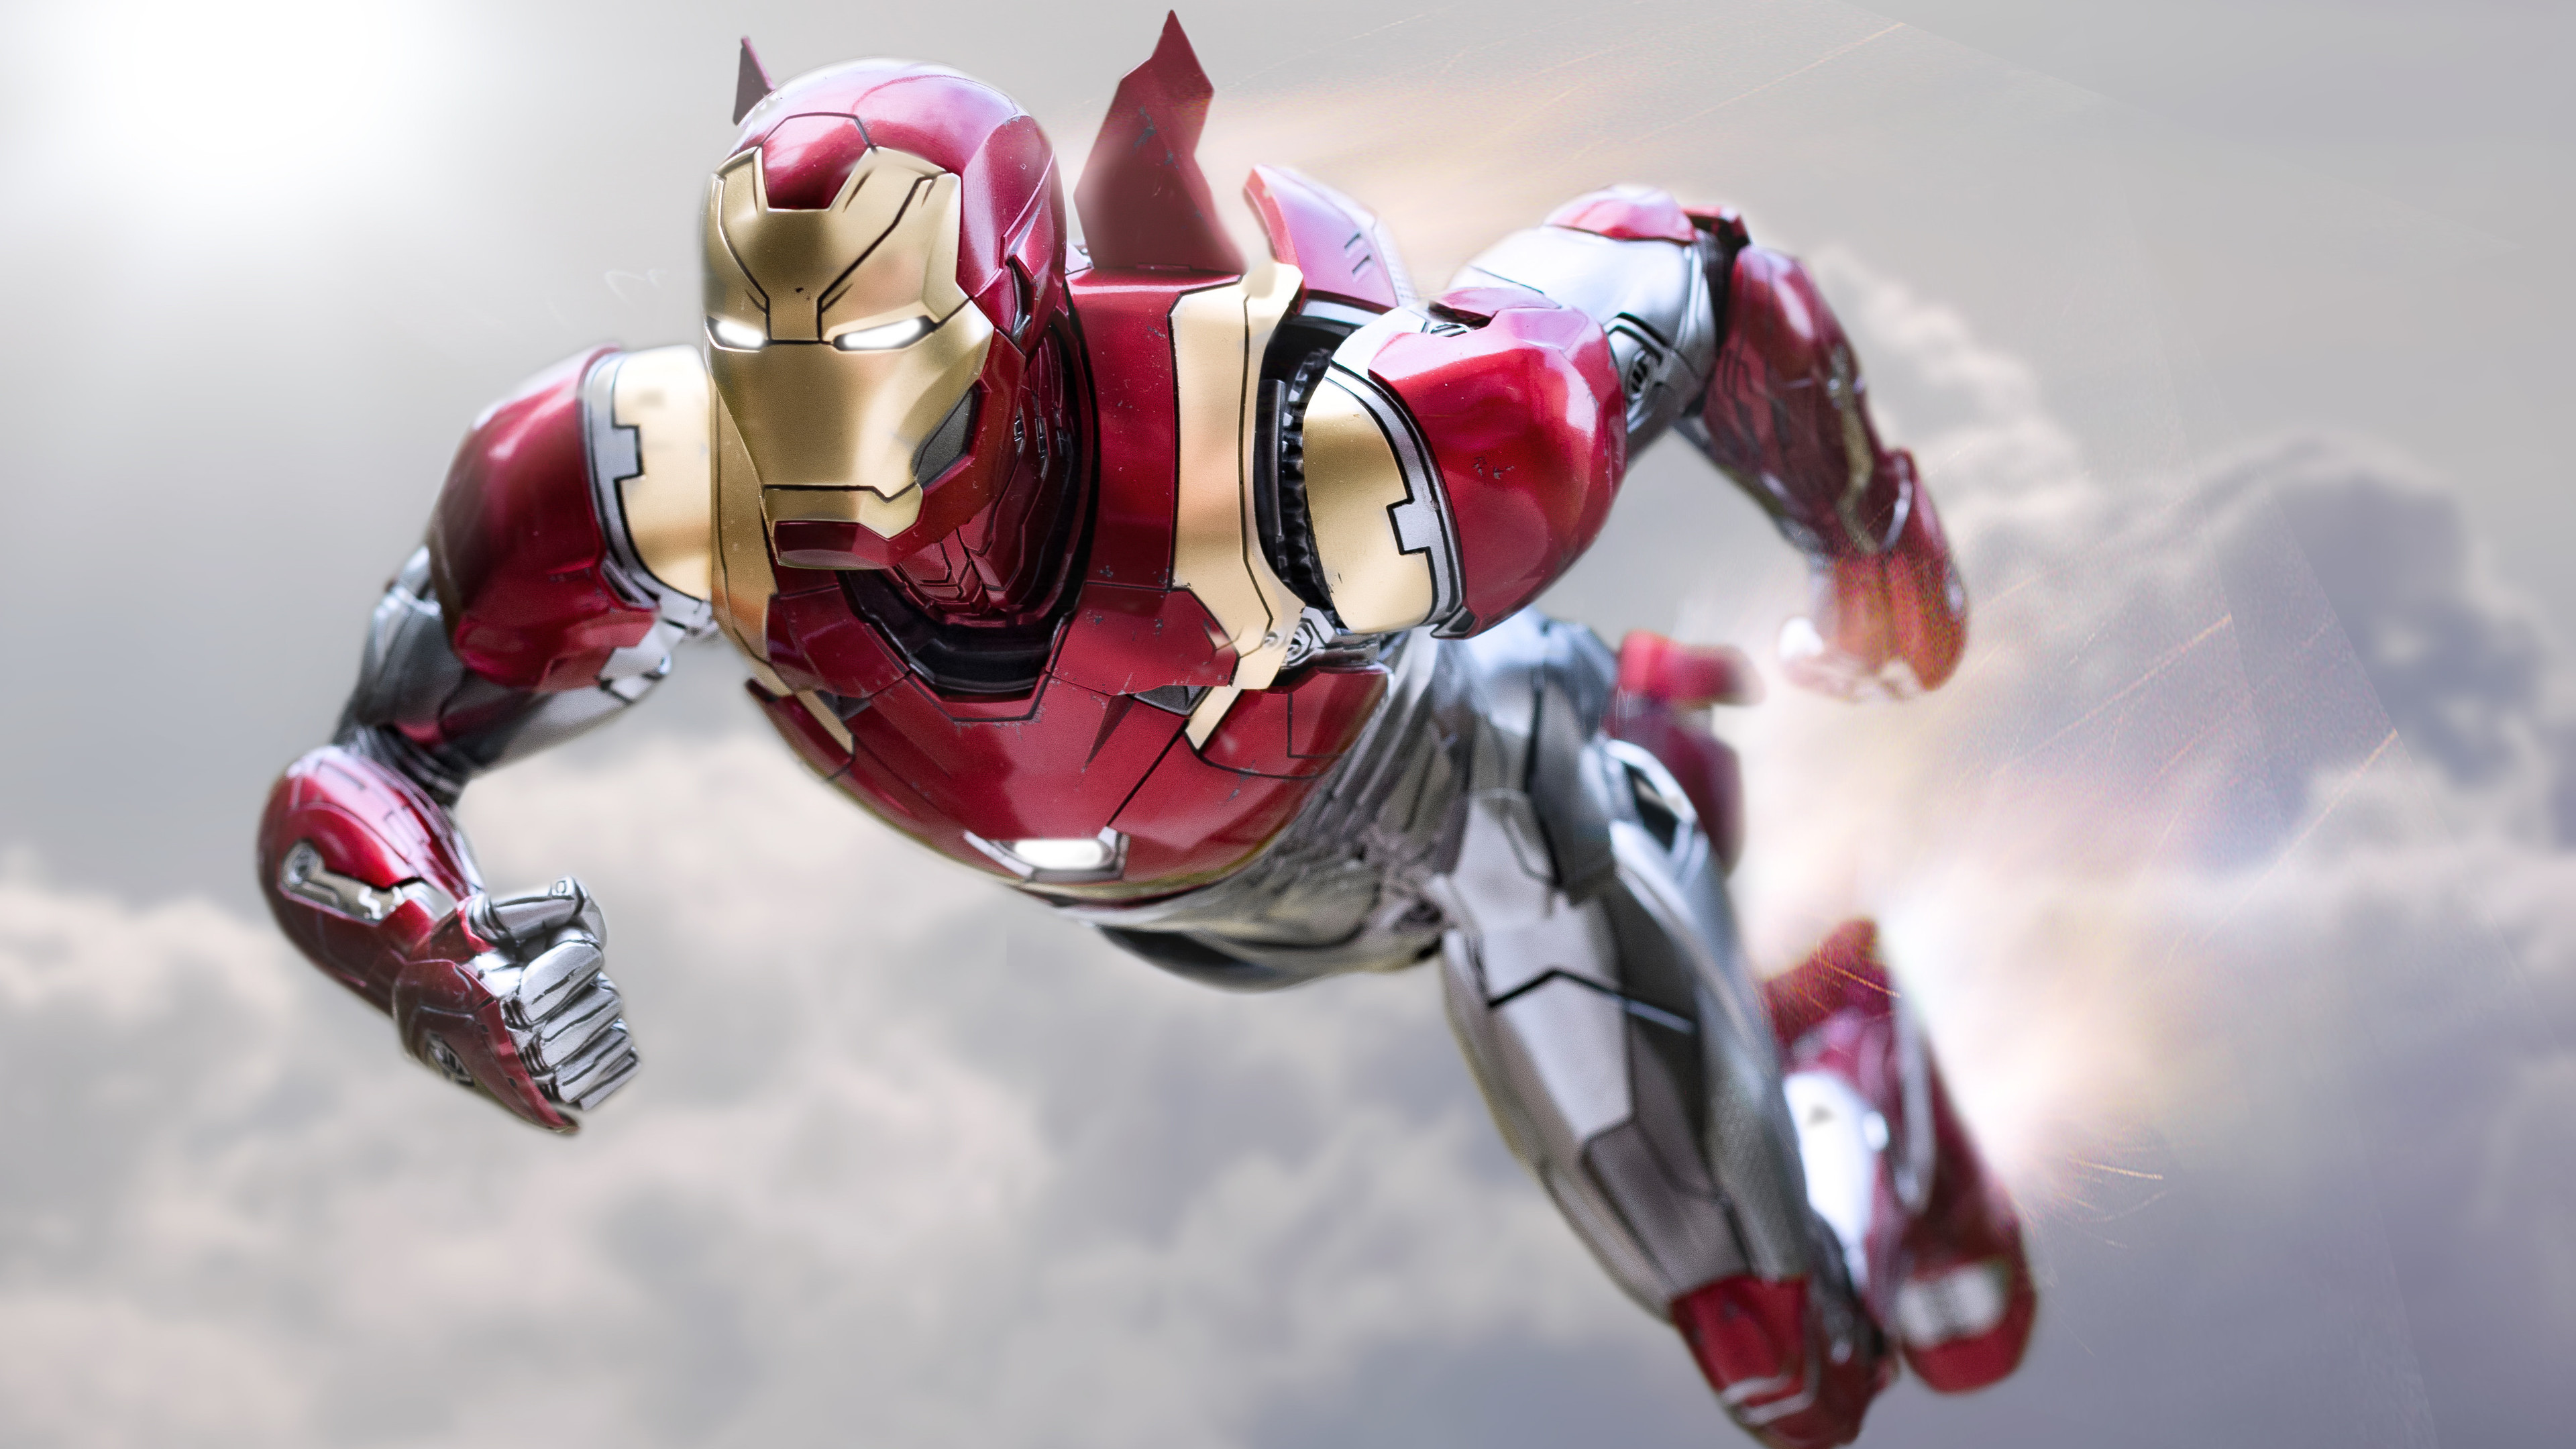 iron man 4k new 1543620361 - Iron Man 4k New - superheroes wallpapers, iron man wallpapers, hd-wallpapers, digital art wallpapers, artwork wallpapers, art wallpapers, 4k-wallpapers